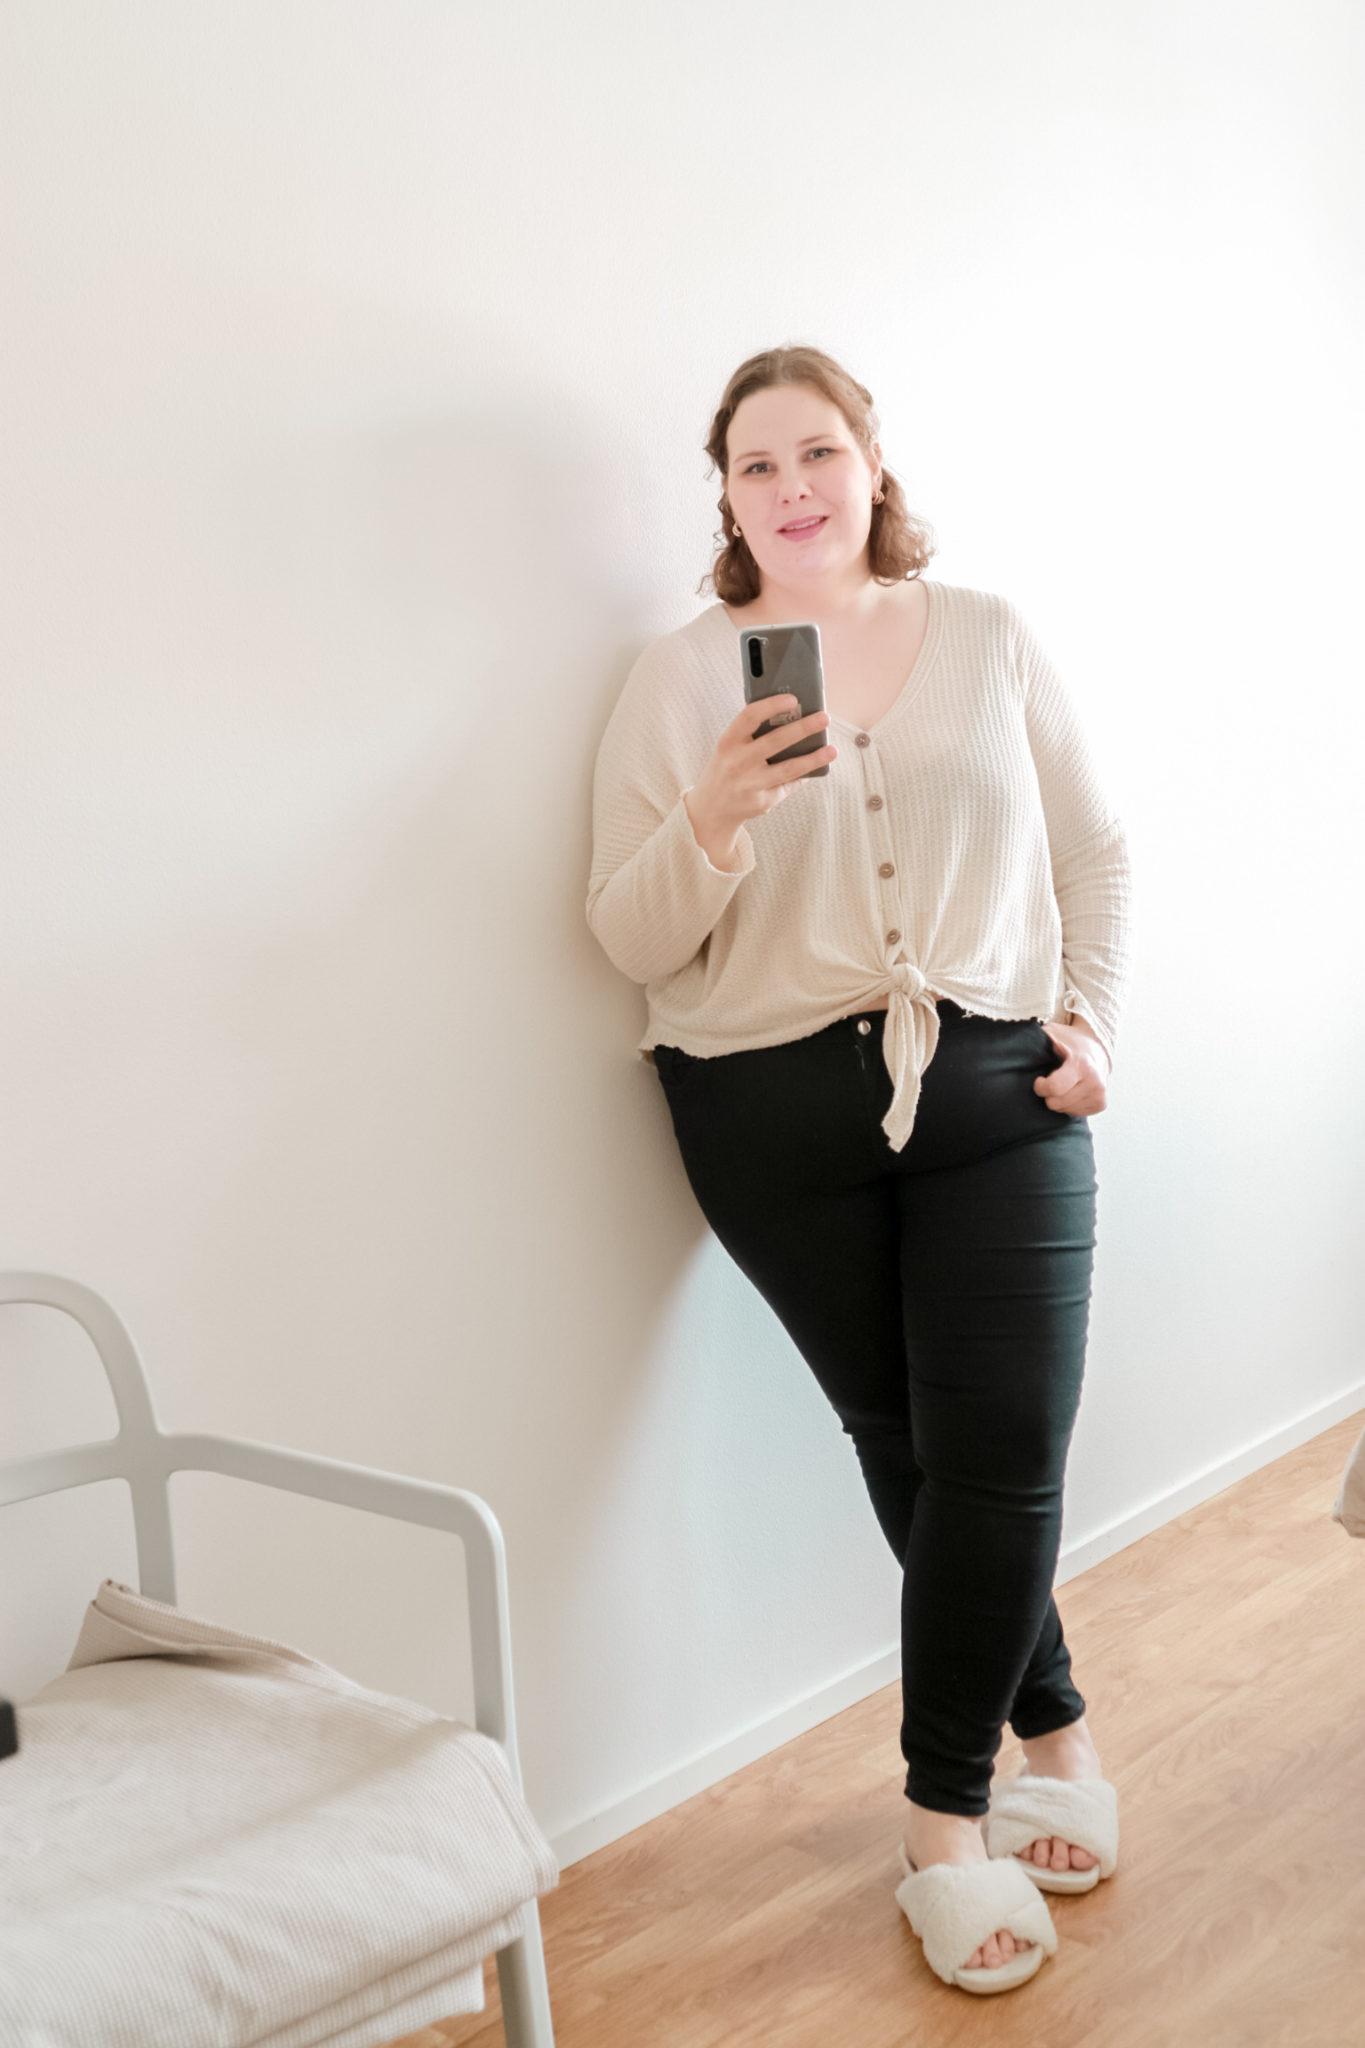 Mustat housut ja lyhyt neuletakki - Big mamas home by Jenni